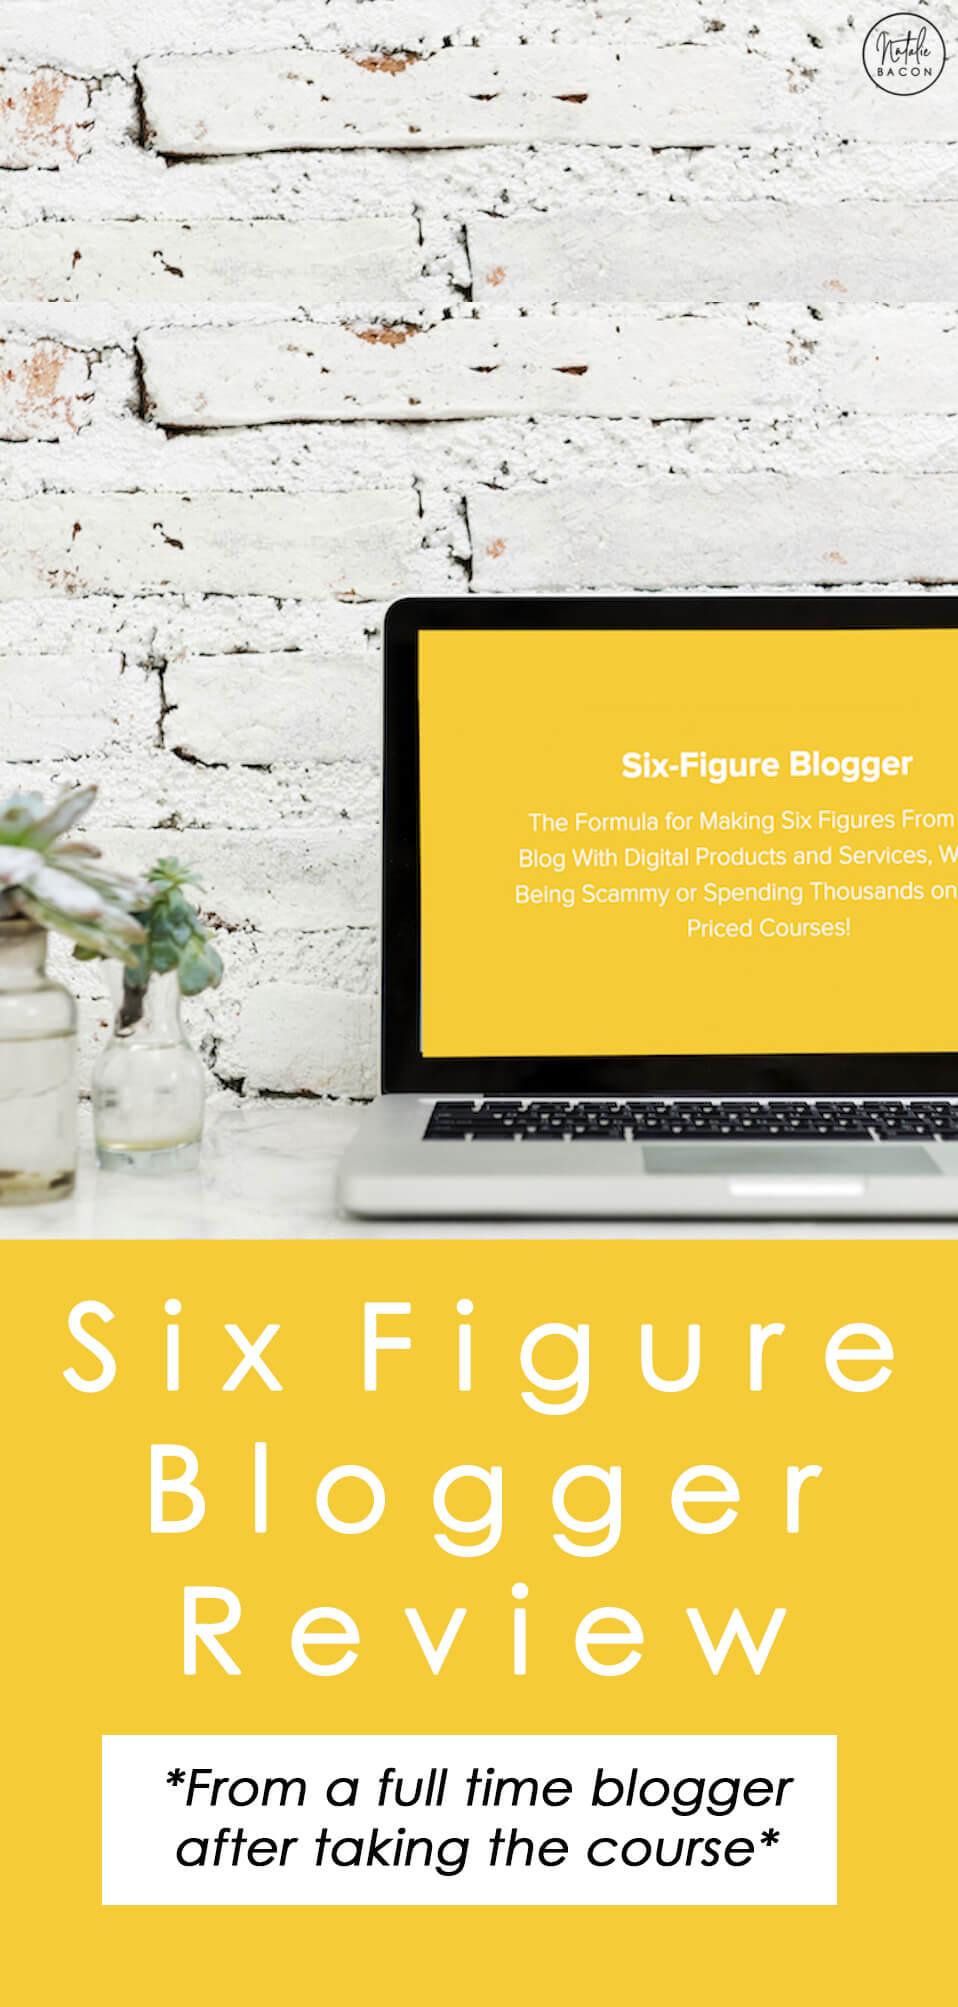 Monetizing Your Blog: Six Figure Blogger Review